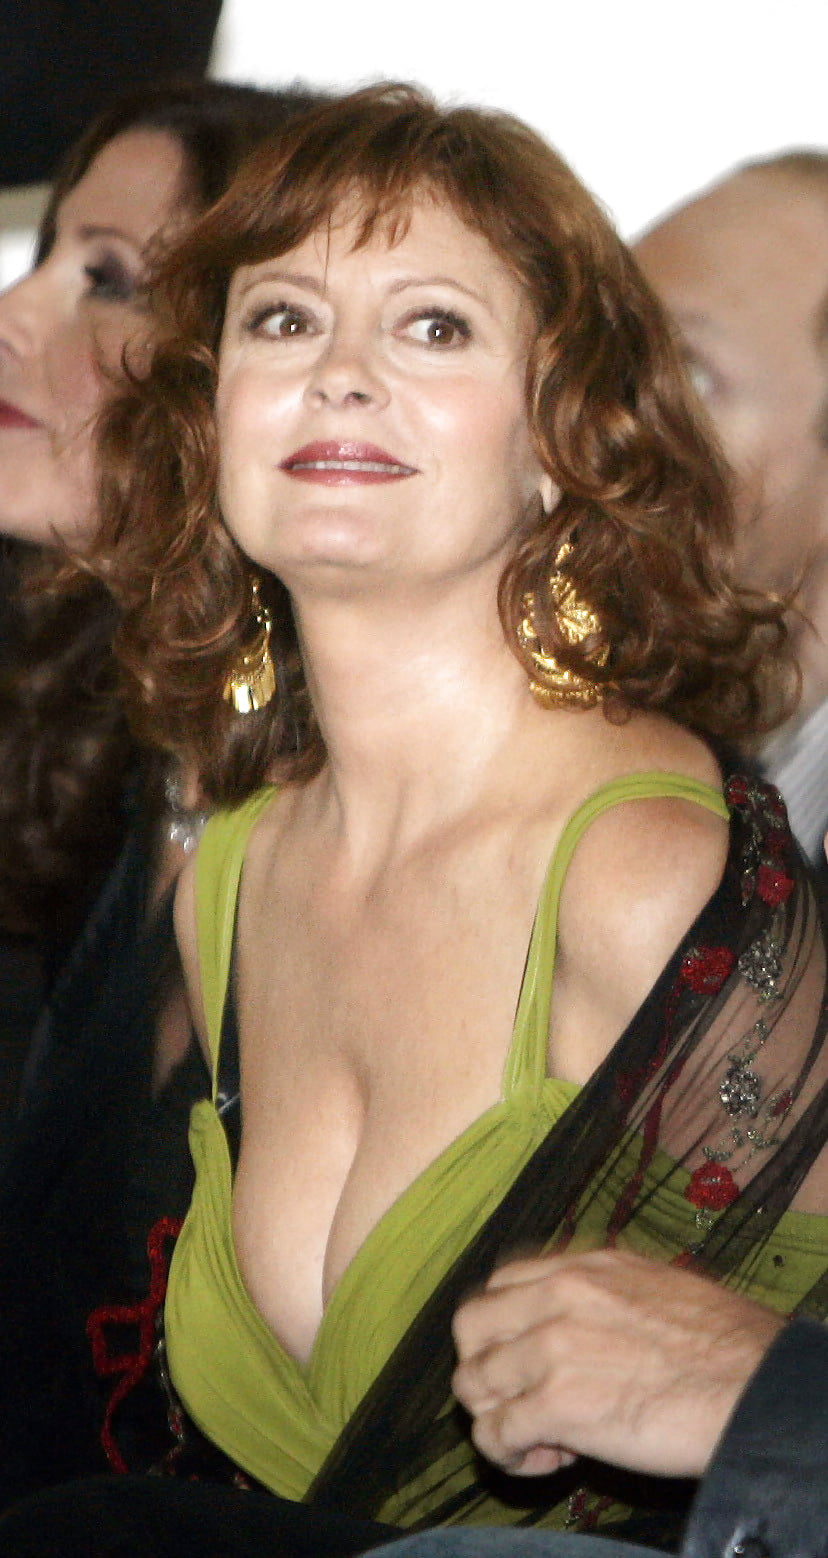 Susan sarandon down blouse, my space oral sex instruction